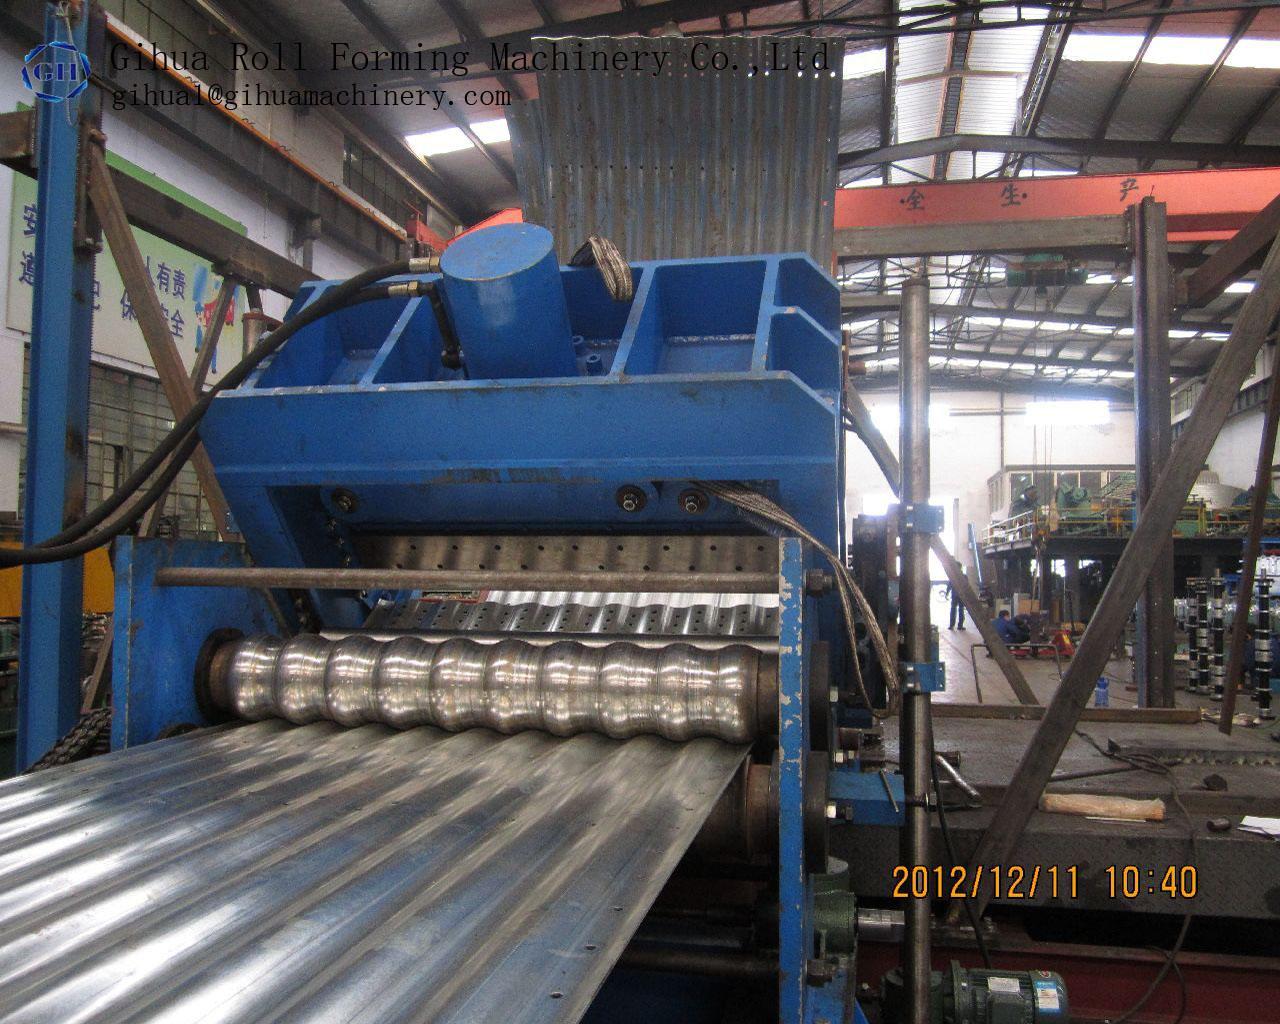 Grain storage silo roll forming machine